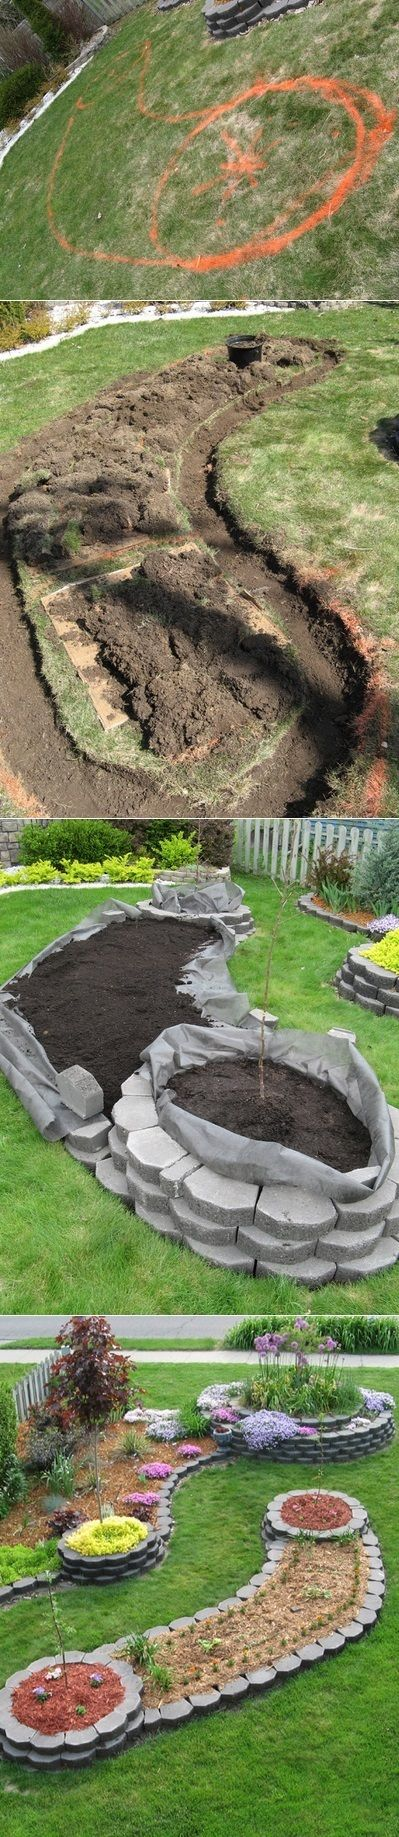 Alternative Gardning: Island bed garden design